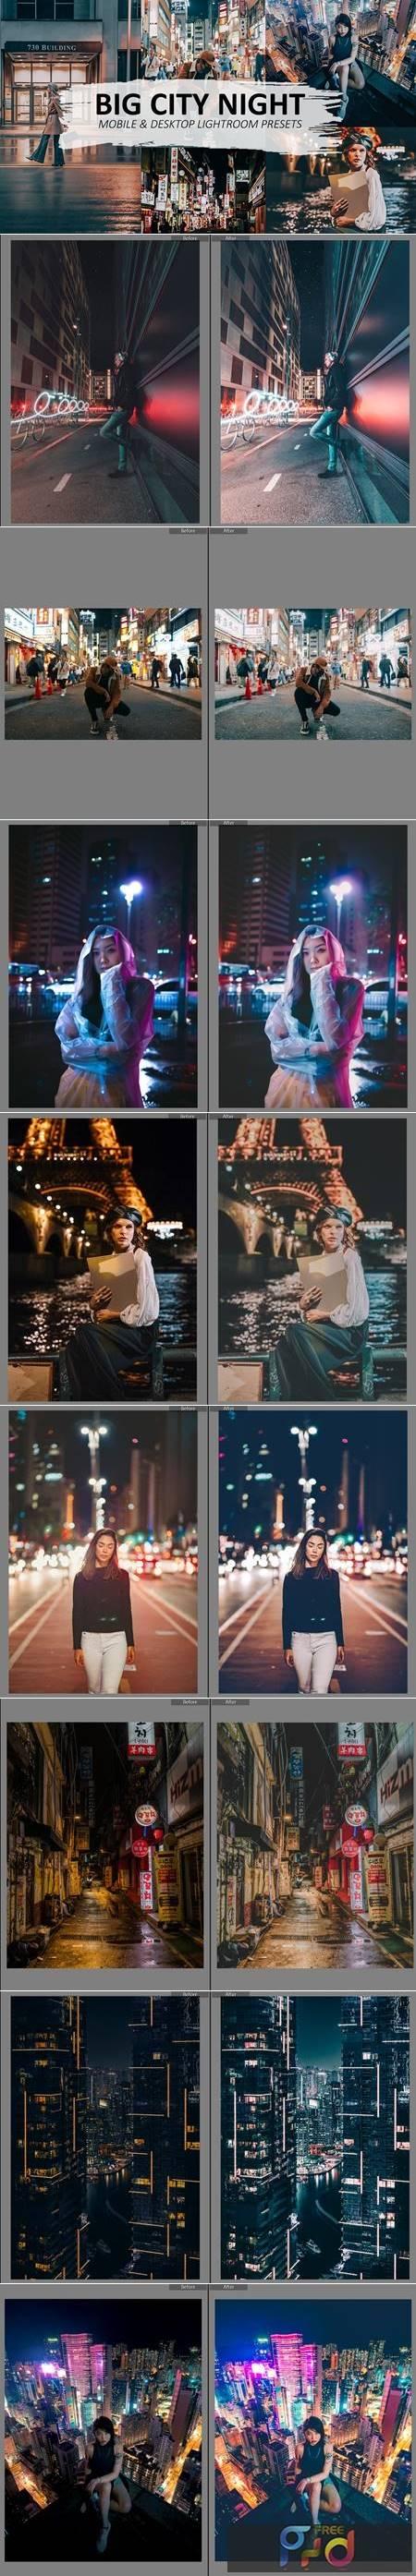 Night Photography Lightroom Preset 5597802 1